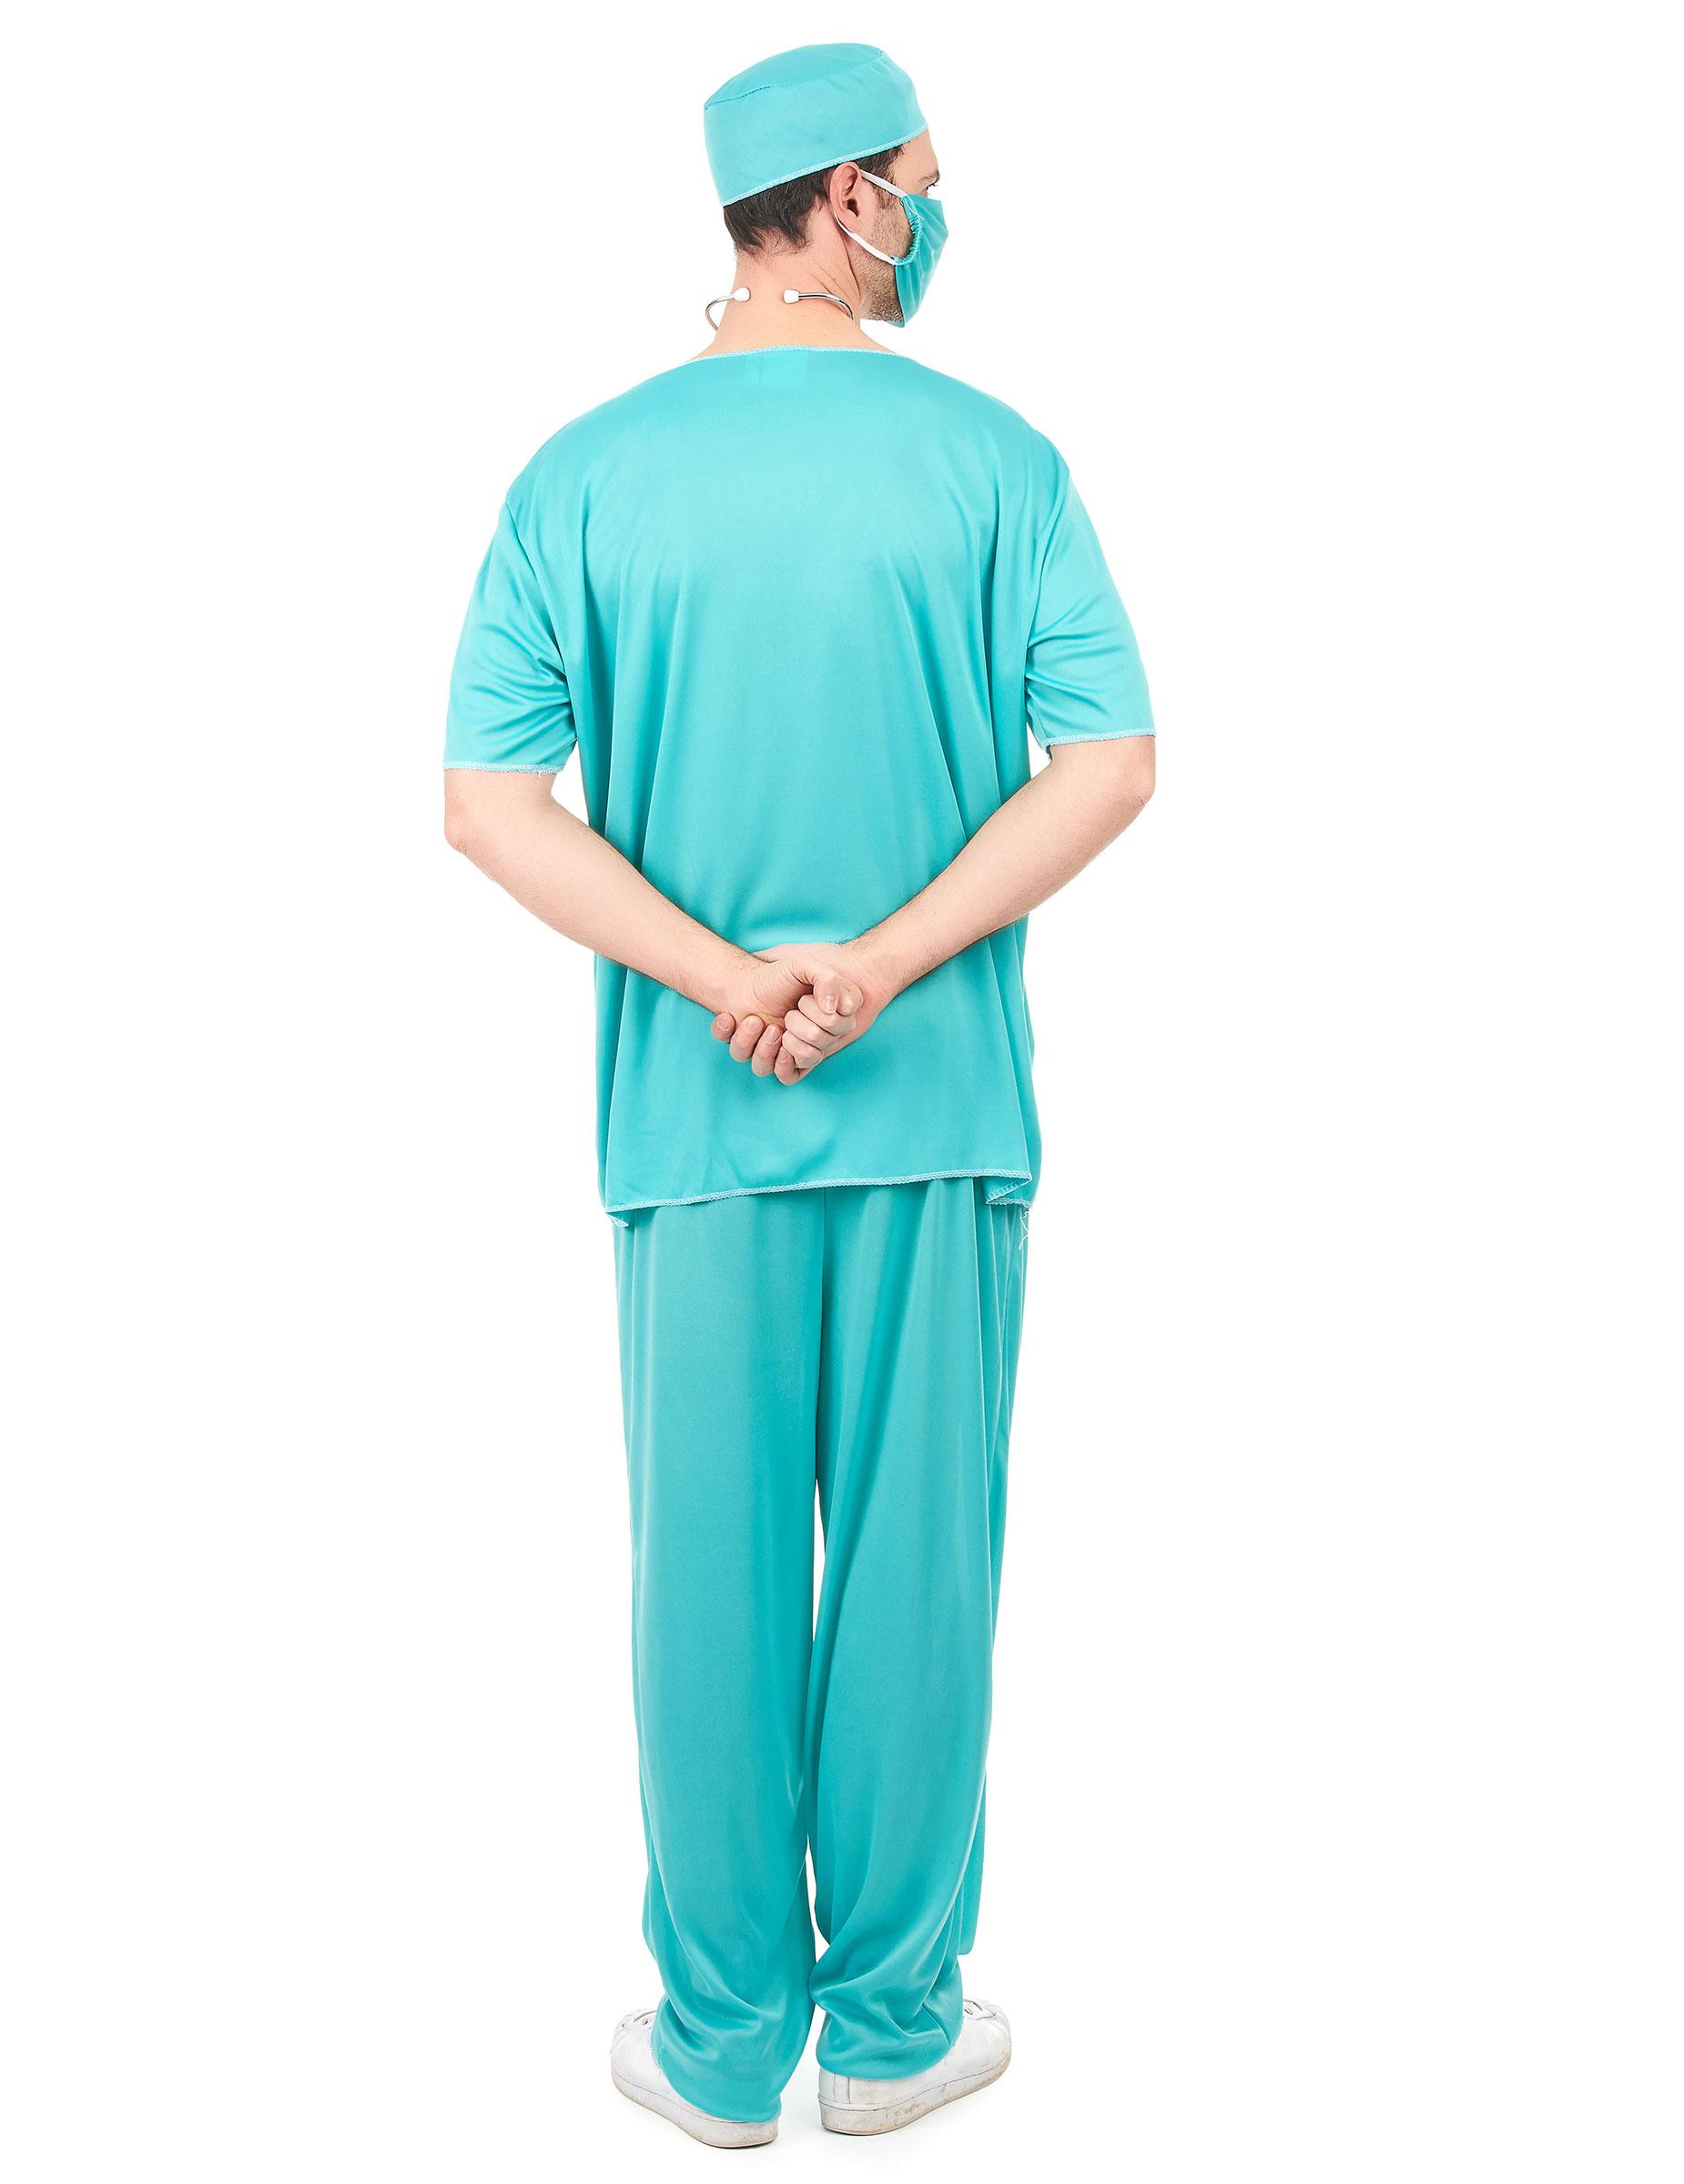 Rosenthal medico Costume Nuovo-Uomo Carnevale Travestimento Costume DR